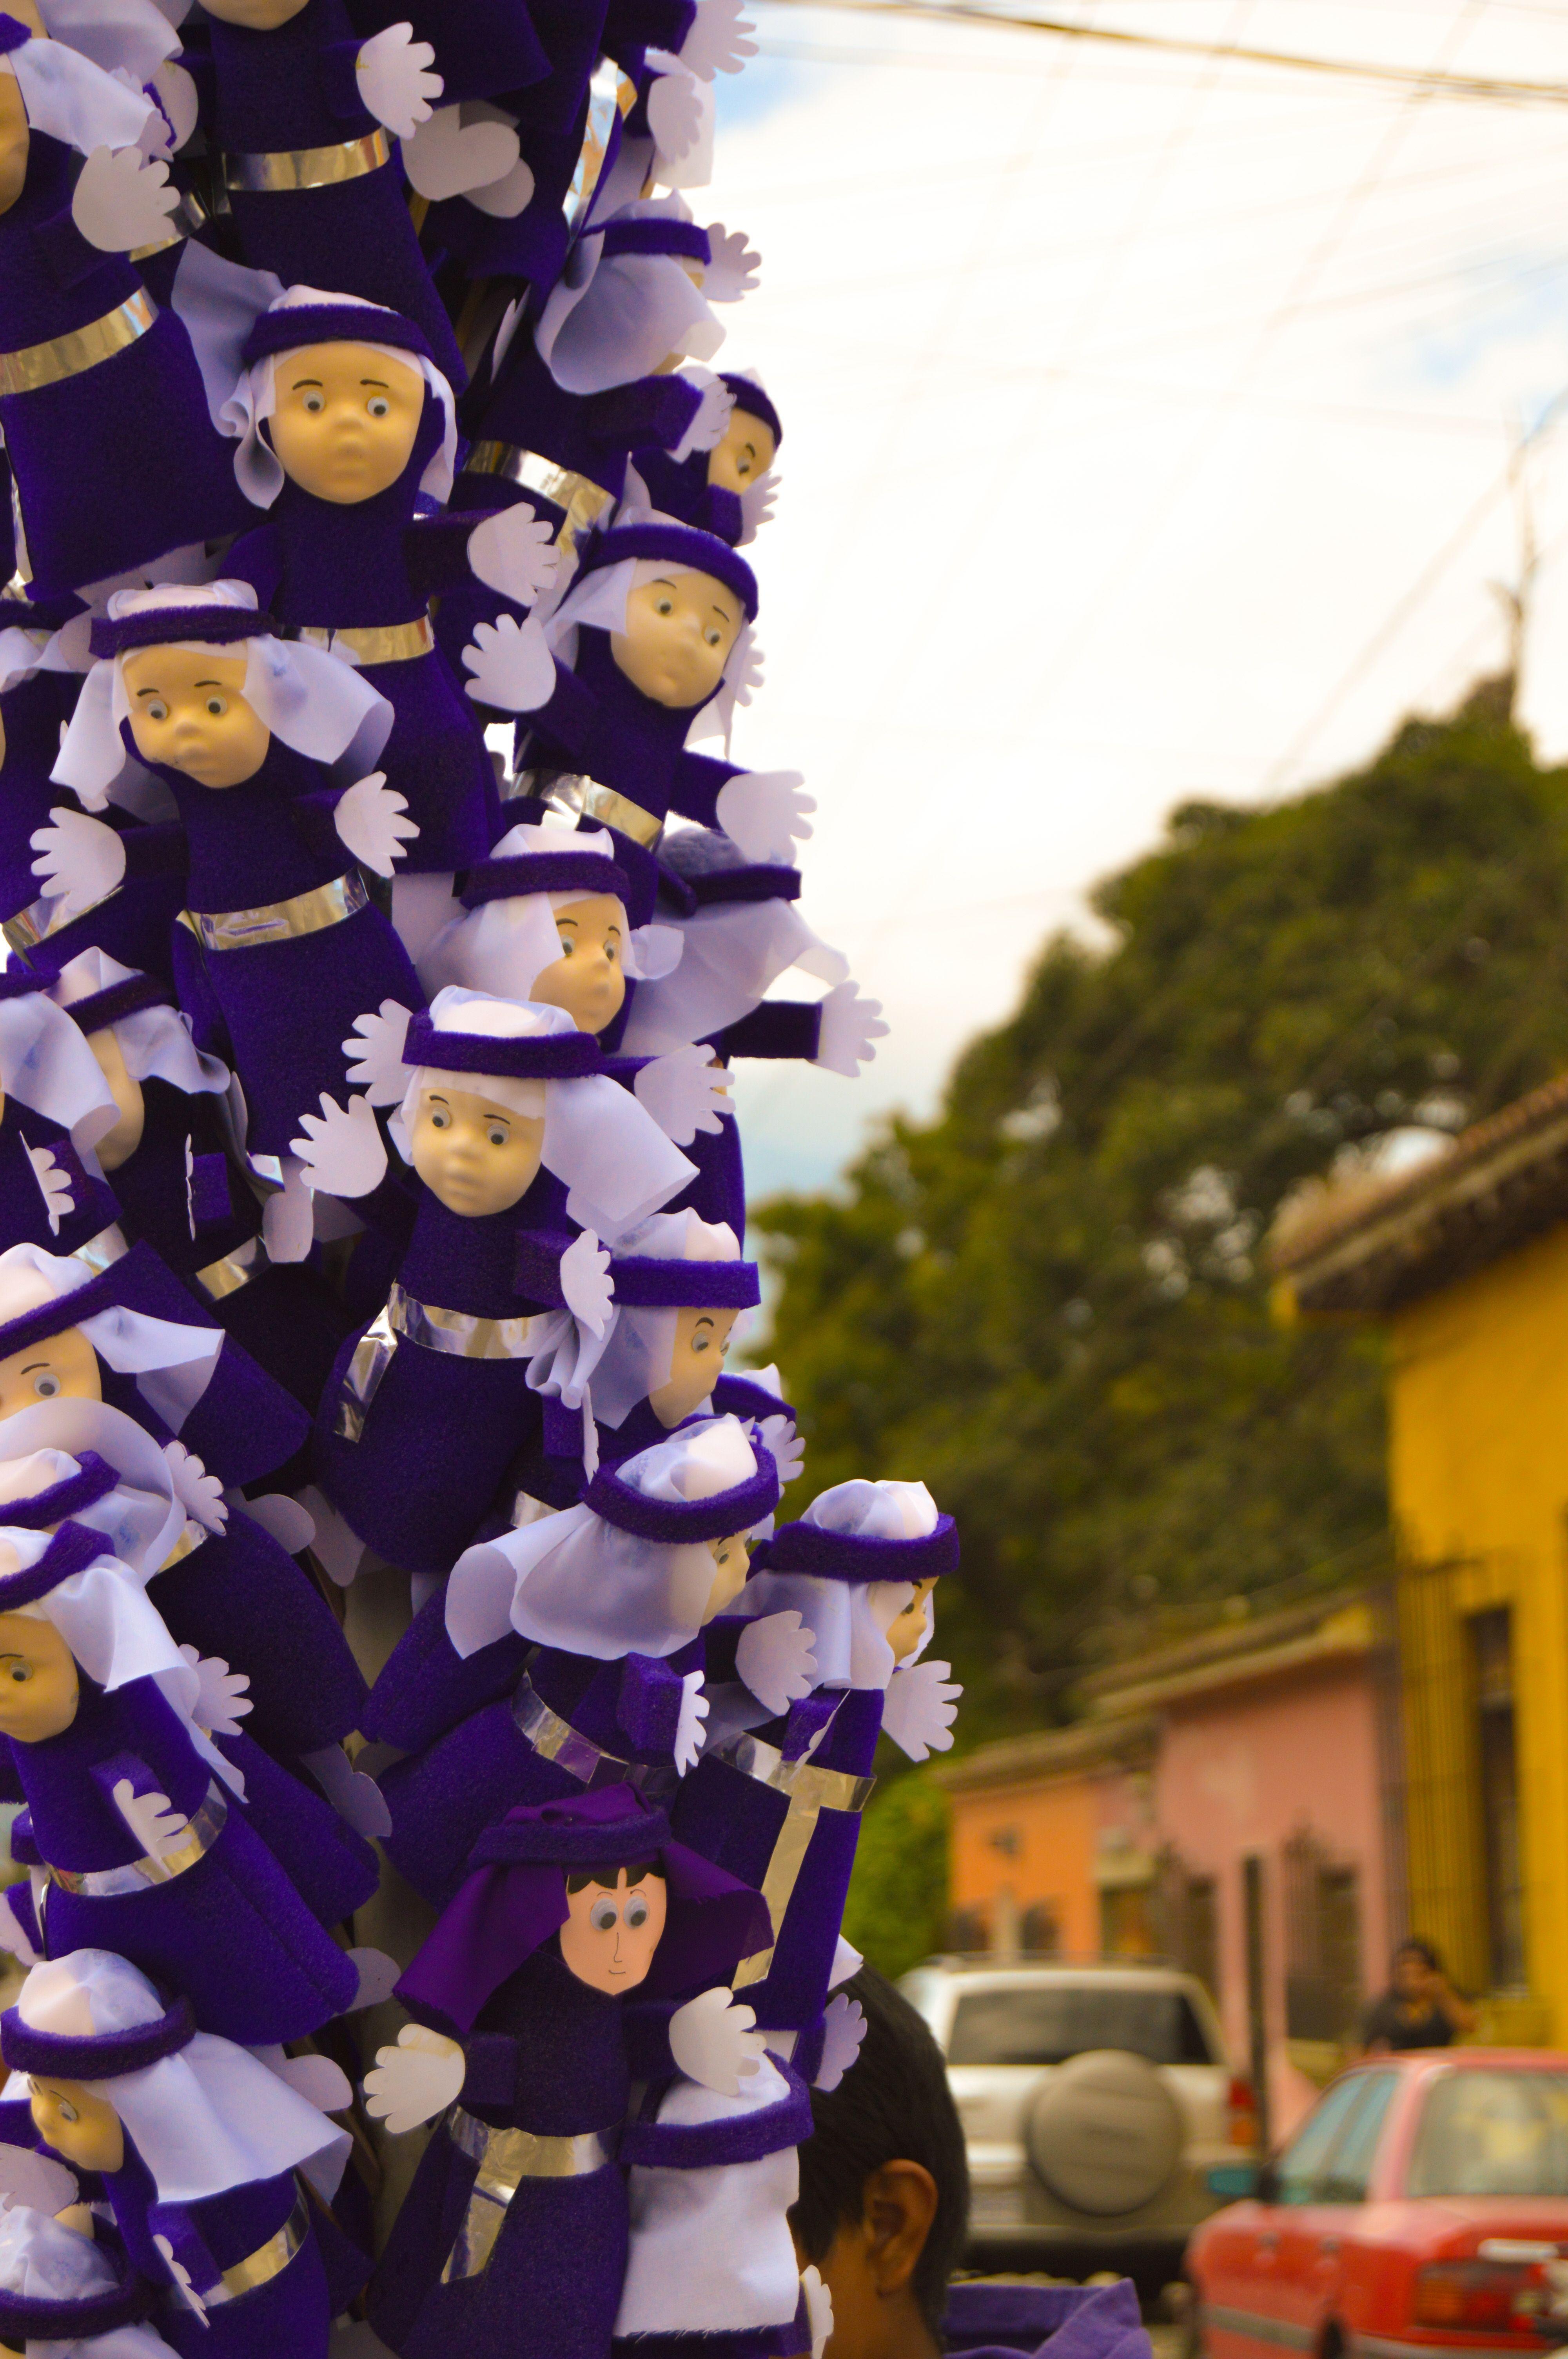 Juguetes de Cucurucho - Cucurucho's Toys, Antigua Guatemala, Guatemala